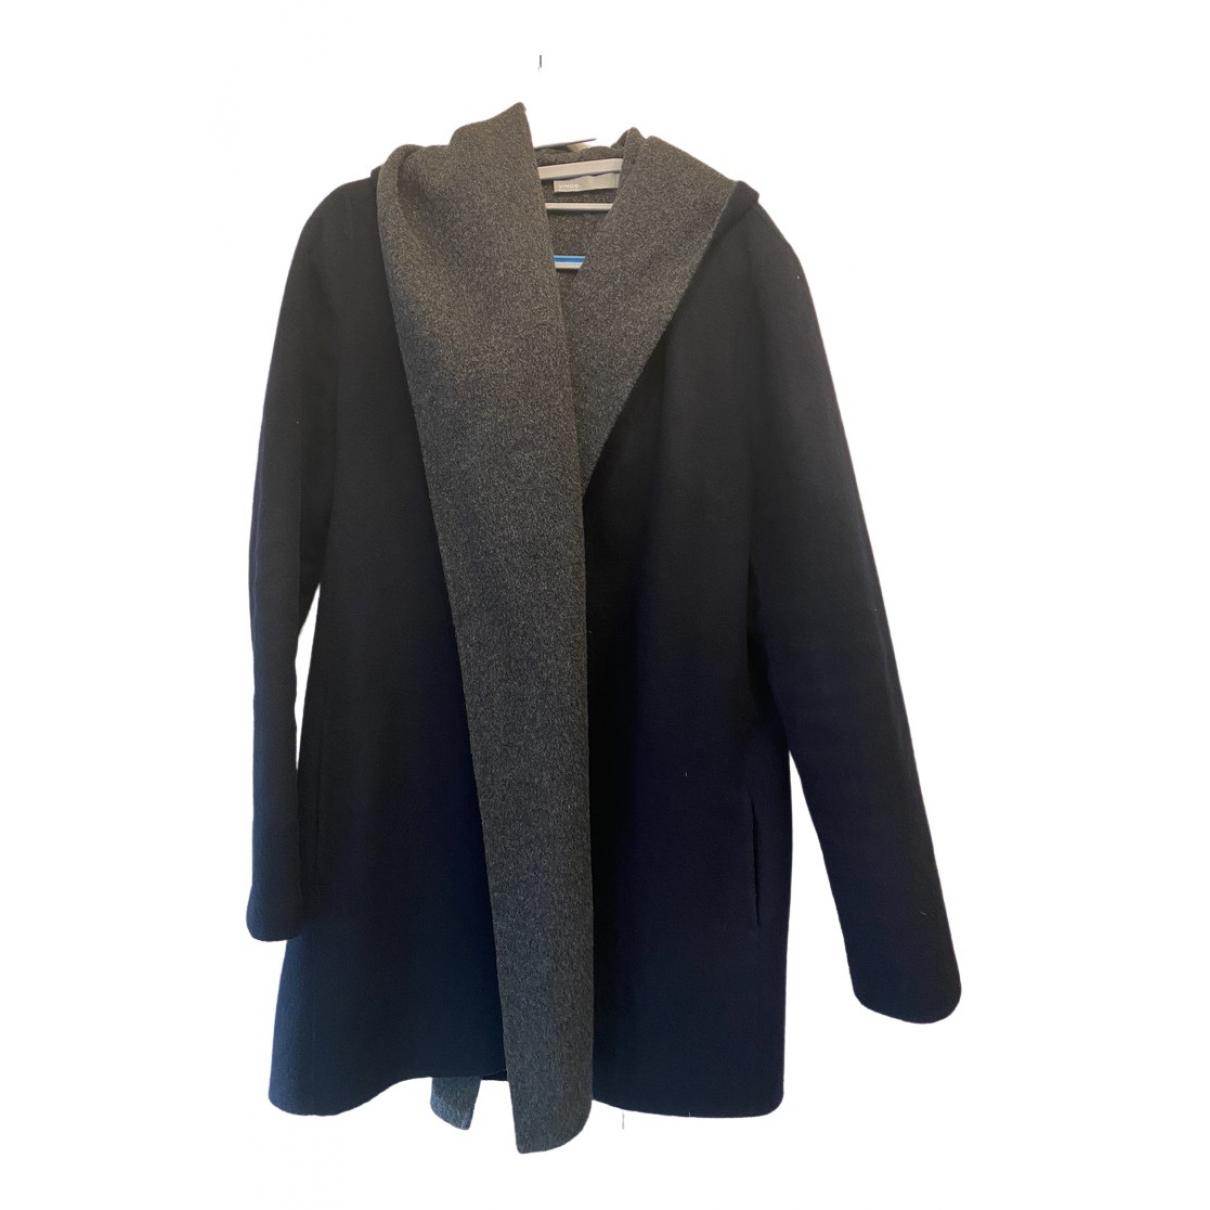 Vince \N Blue Wool coat for Women M International